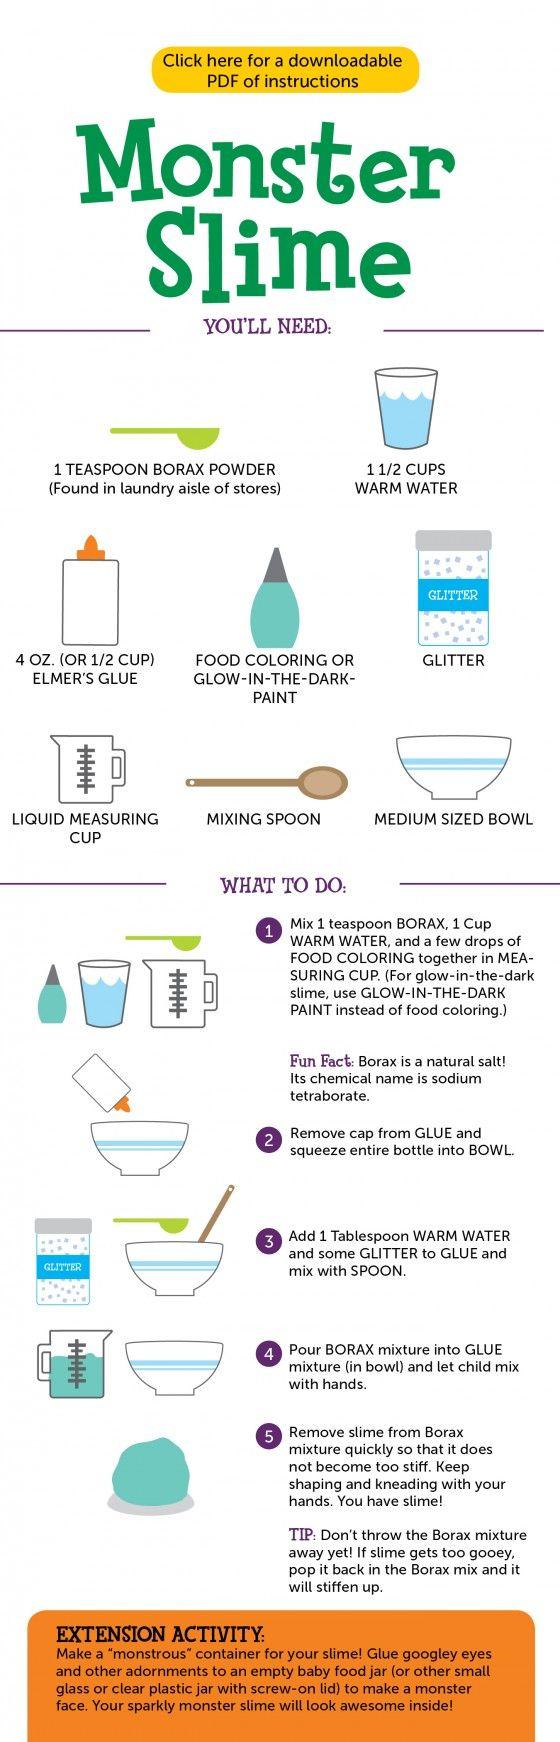 how to make goo instructions